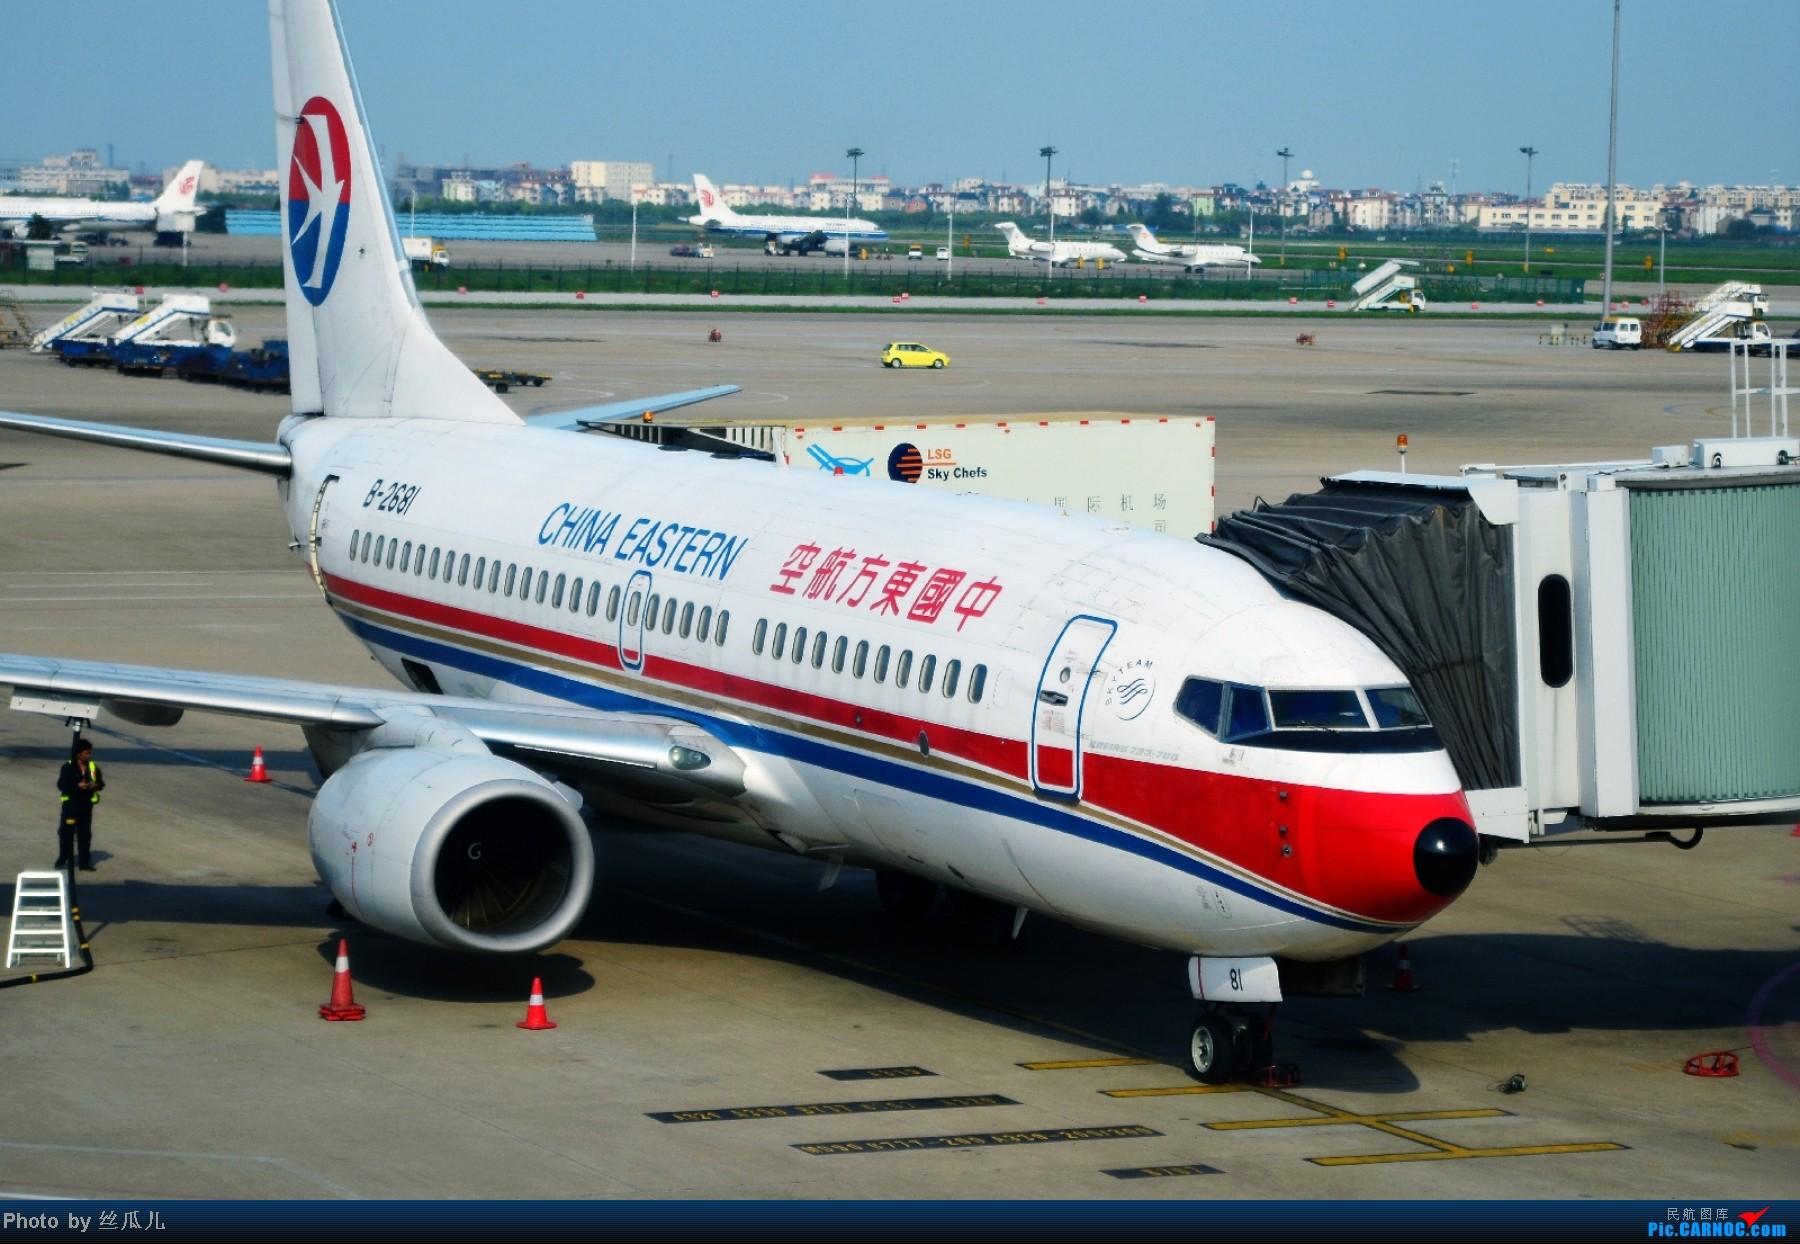 Re:[原创]长途奔袭鸟窝所得,HGH-PEK-HGH,鸟窝上空在我登基前的最后时刻云开雾散,感谢国家,感谢首都人民,感谢CCTV!! BOEING 737-700 B-2681 中国杭州萧山机场